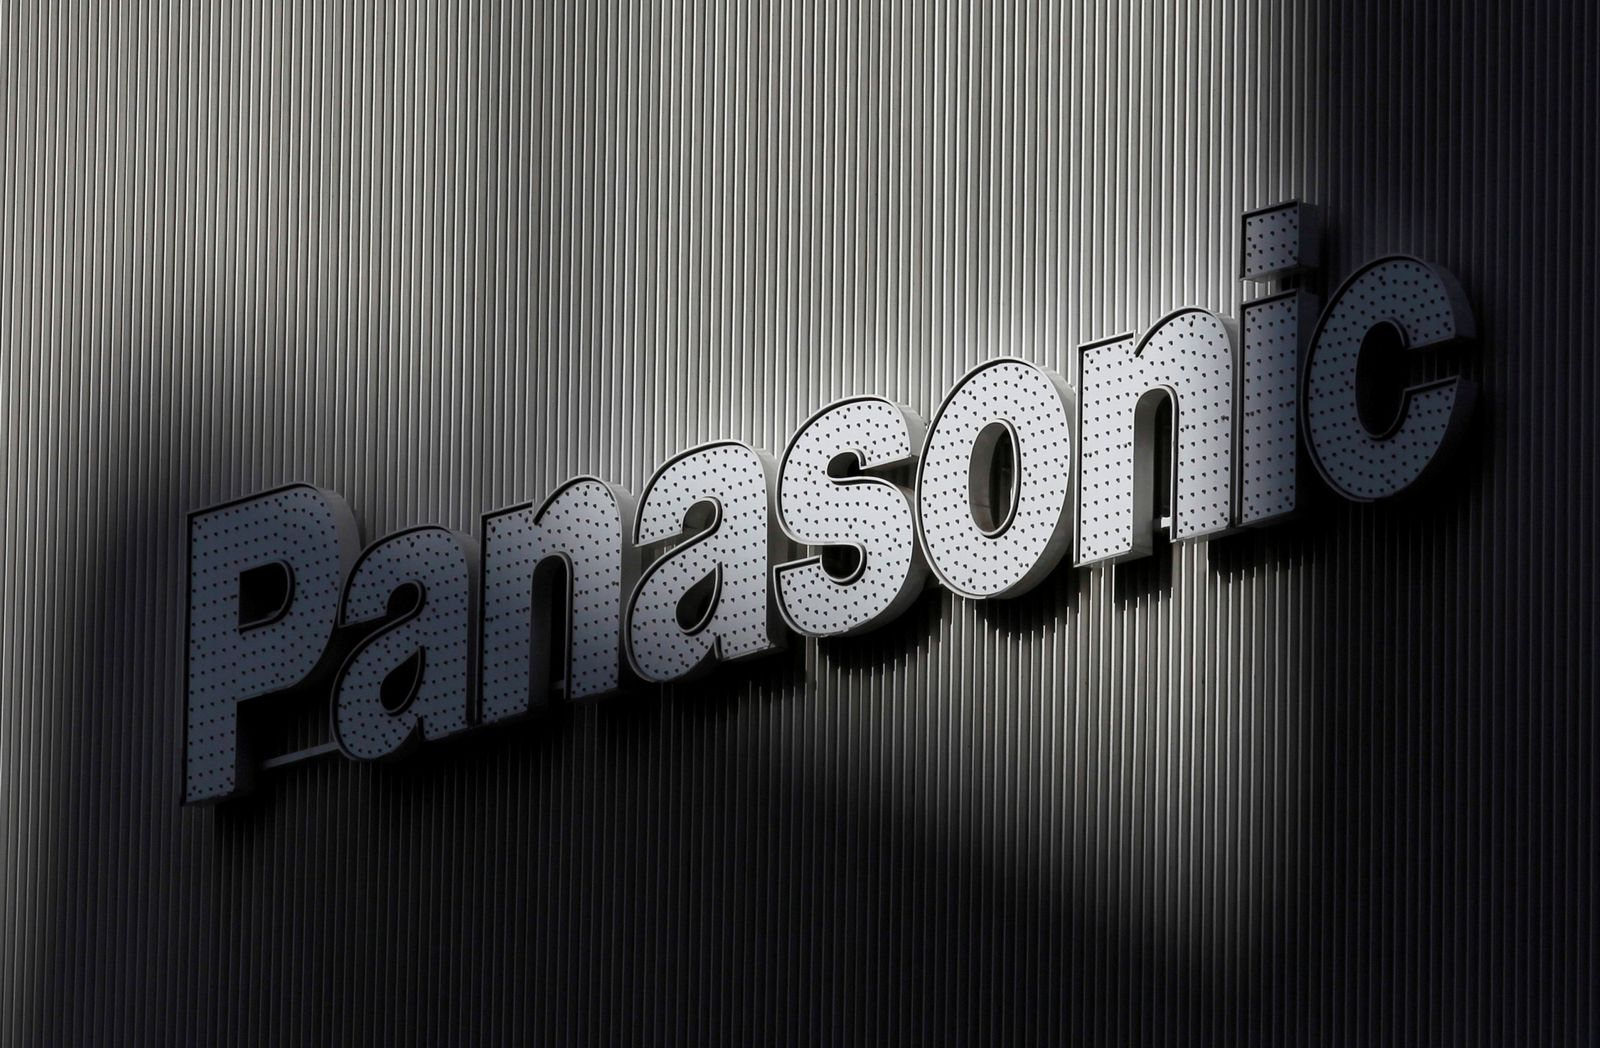 PANASONIC-HEADQUARTERS/